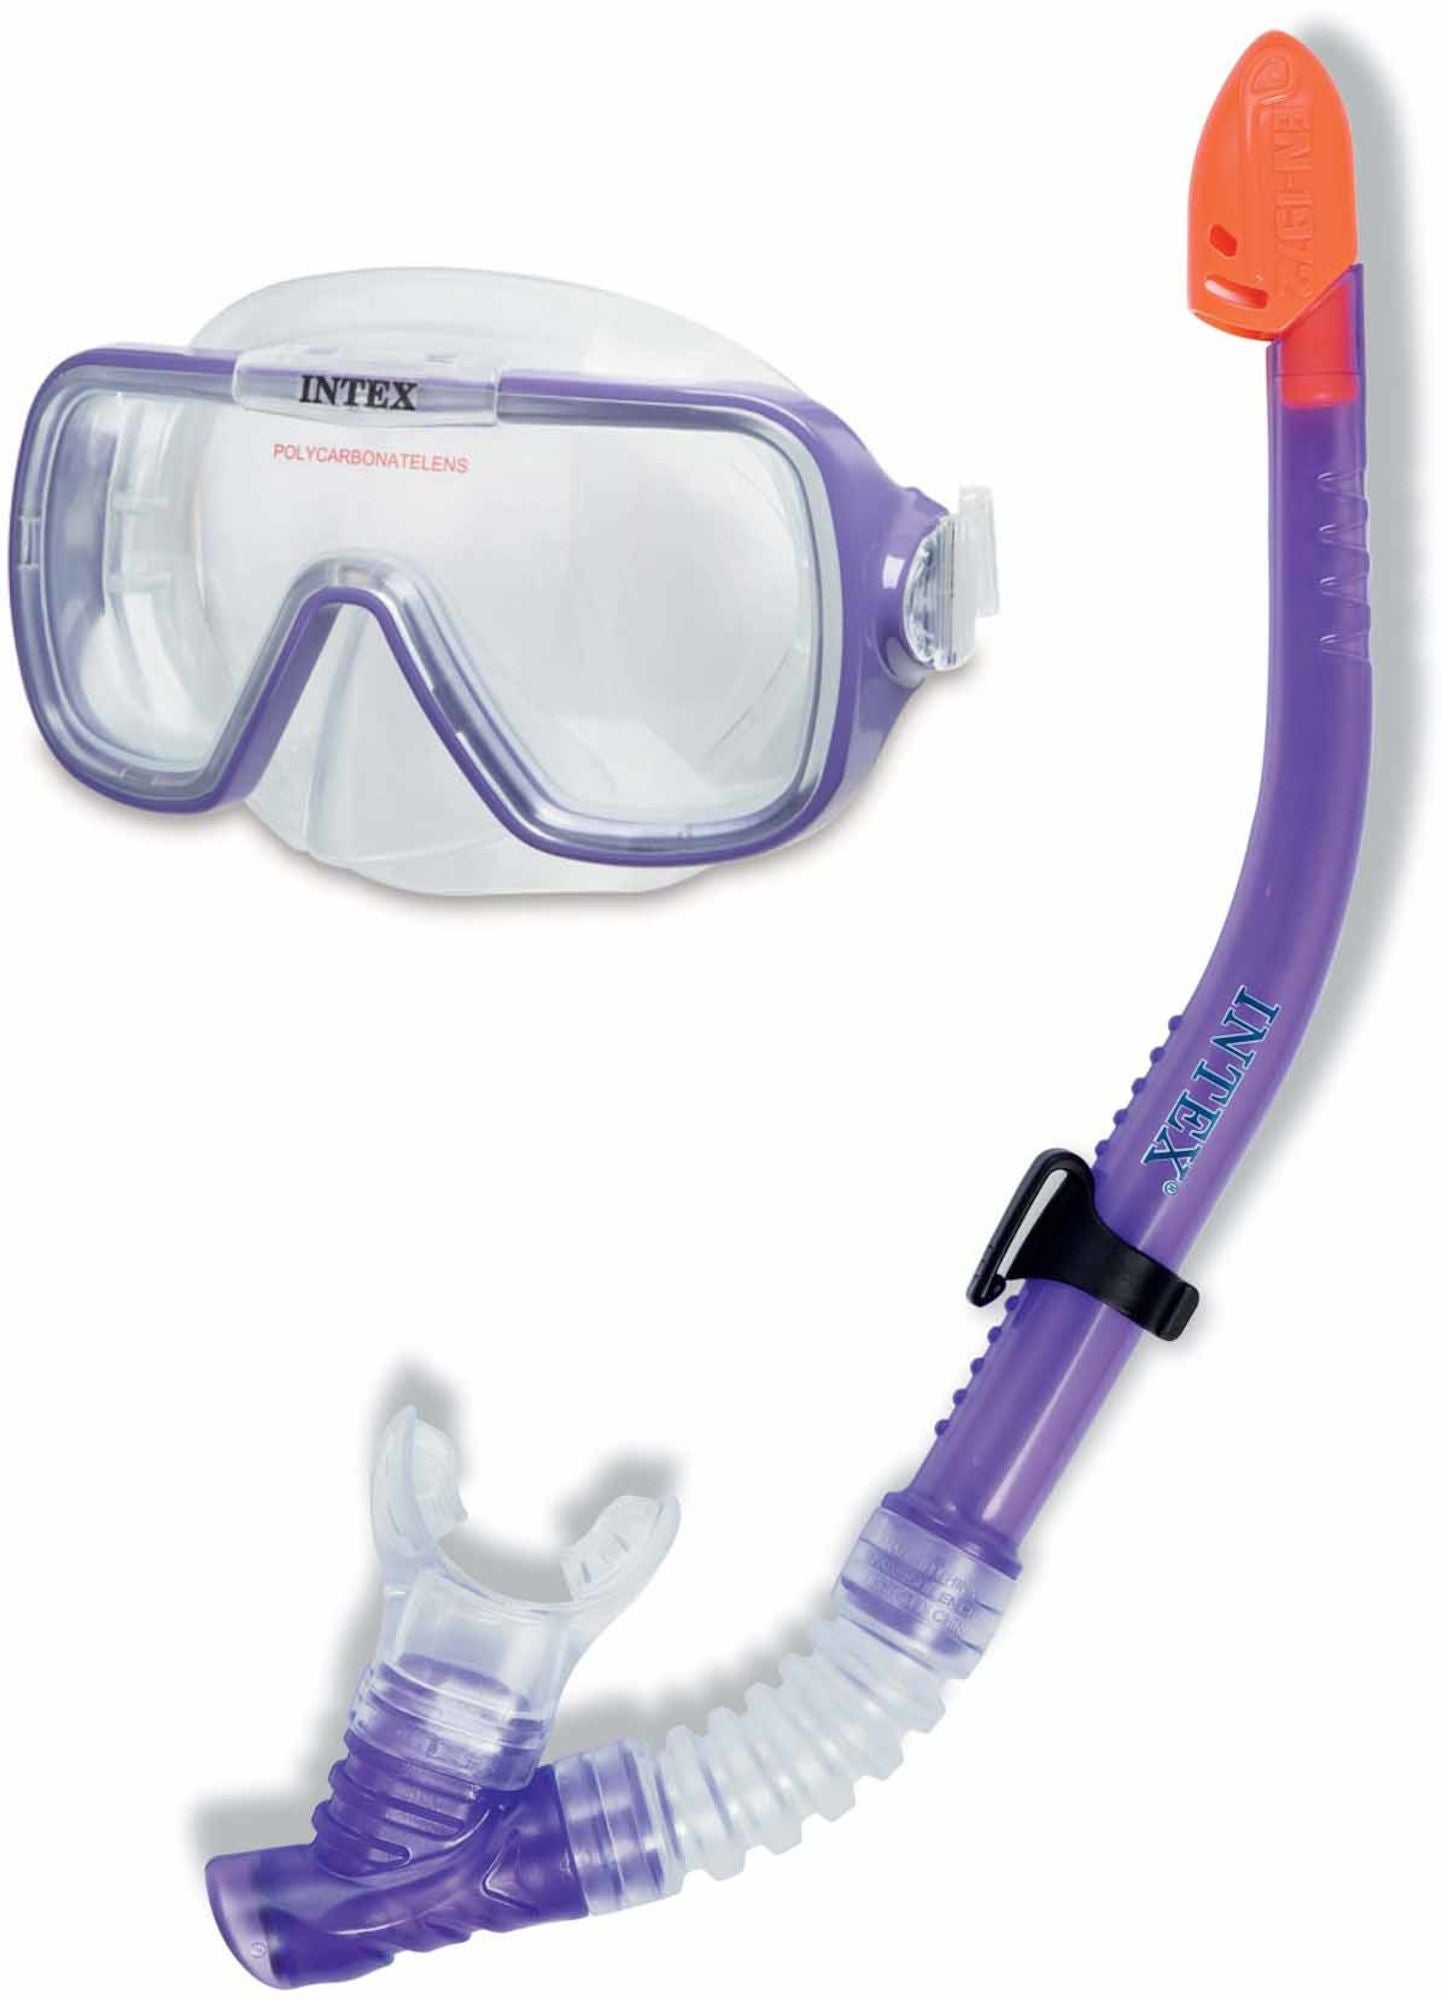 Köp INTEX Snorkelset Cyklop och Snorkel  5fd5f4d110d09